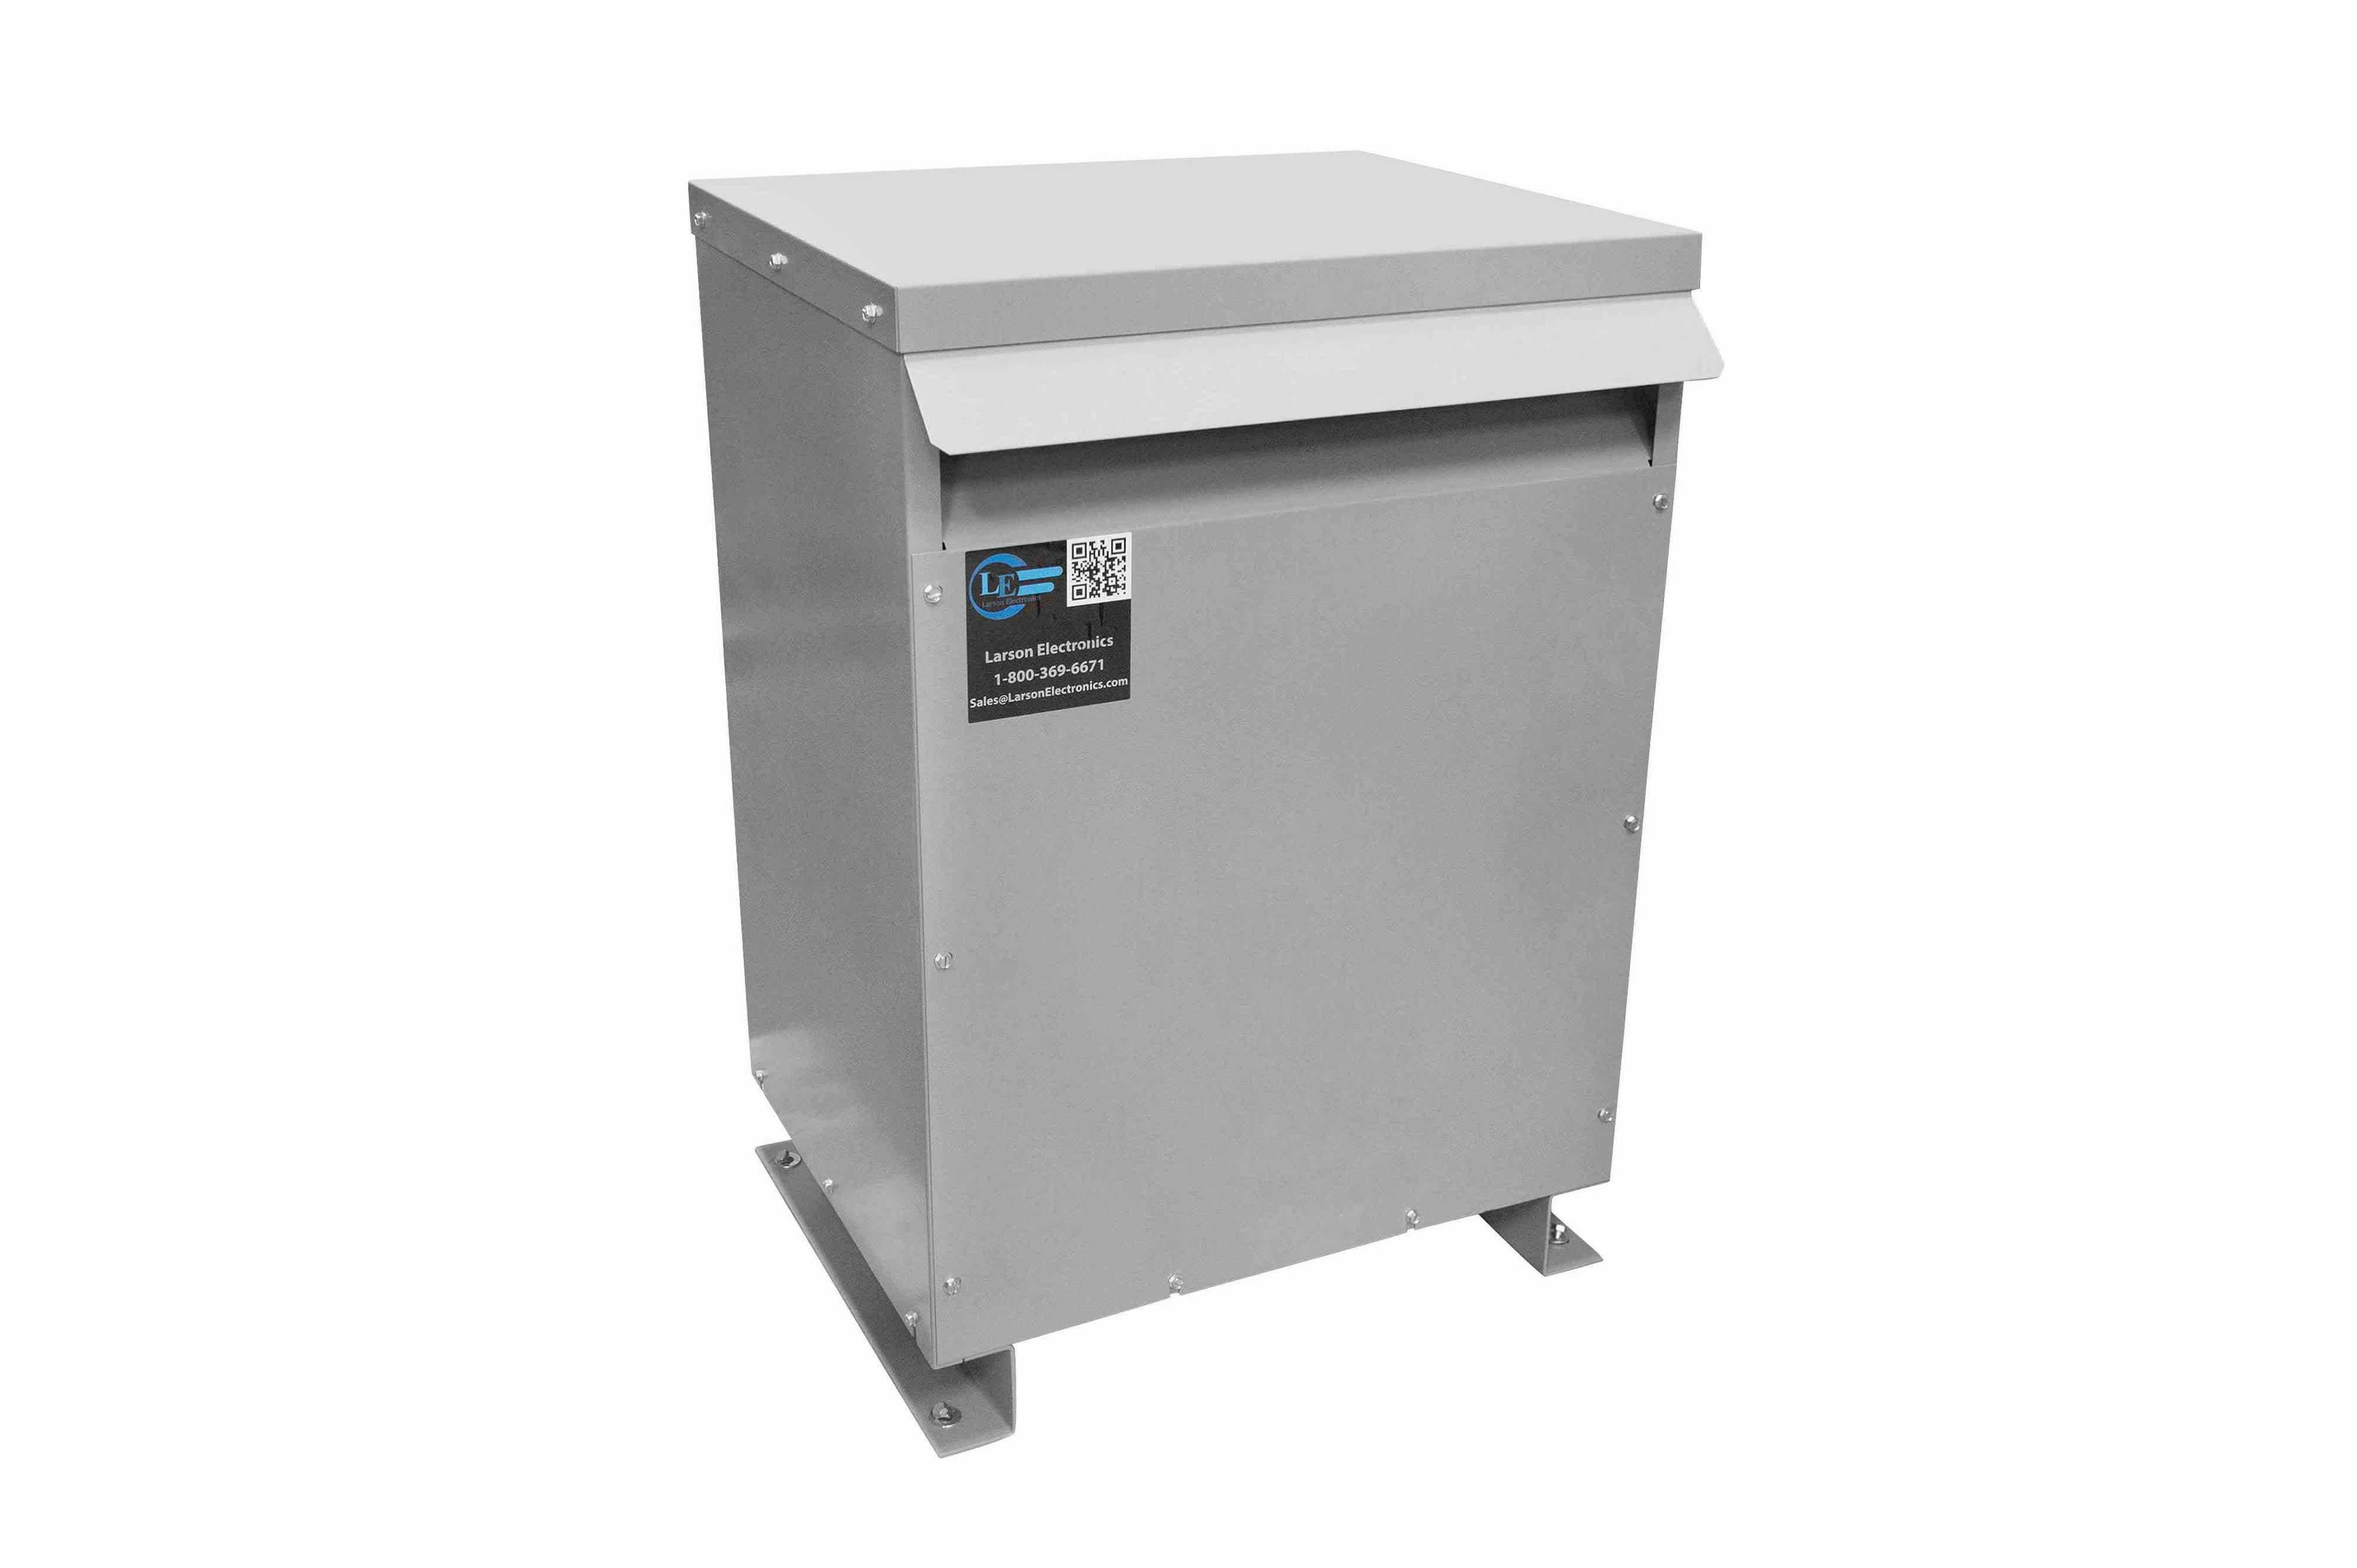 50 kVA 3PH Isolation Transformer, 380V Wye Primary, 600Y/347 Wye-N Secondary, N3R, Ventilated, 60 Hz